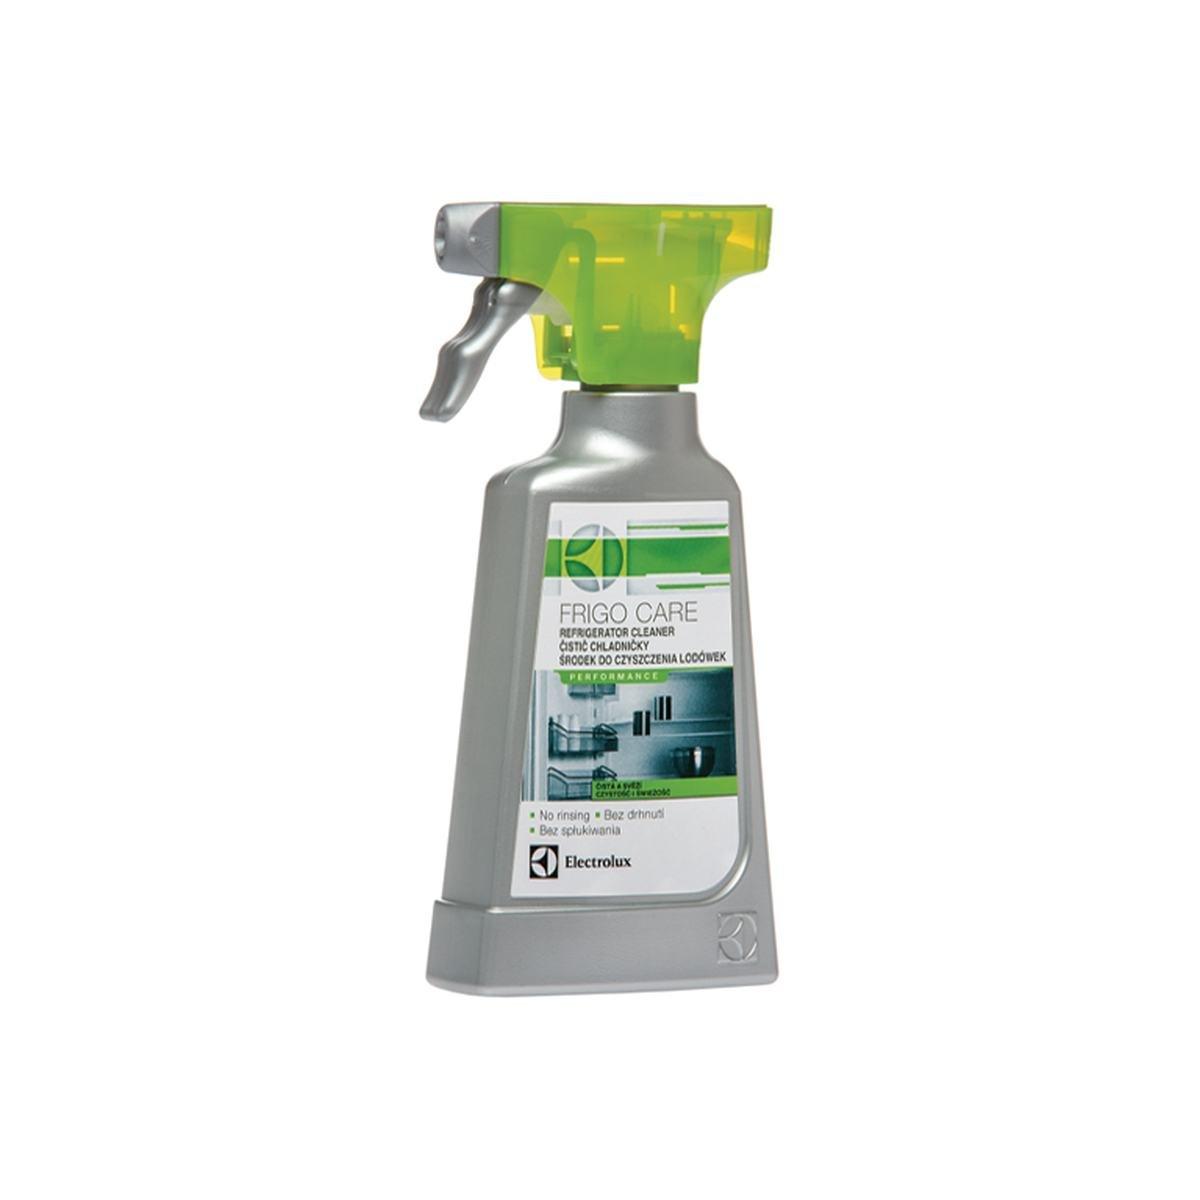 Frigocare rengjøringsmiddel 250 ml. - Electrolux